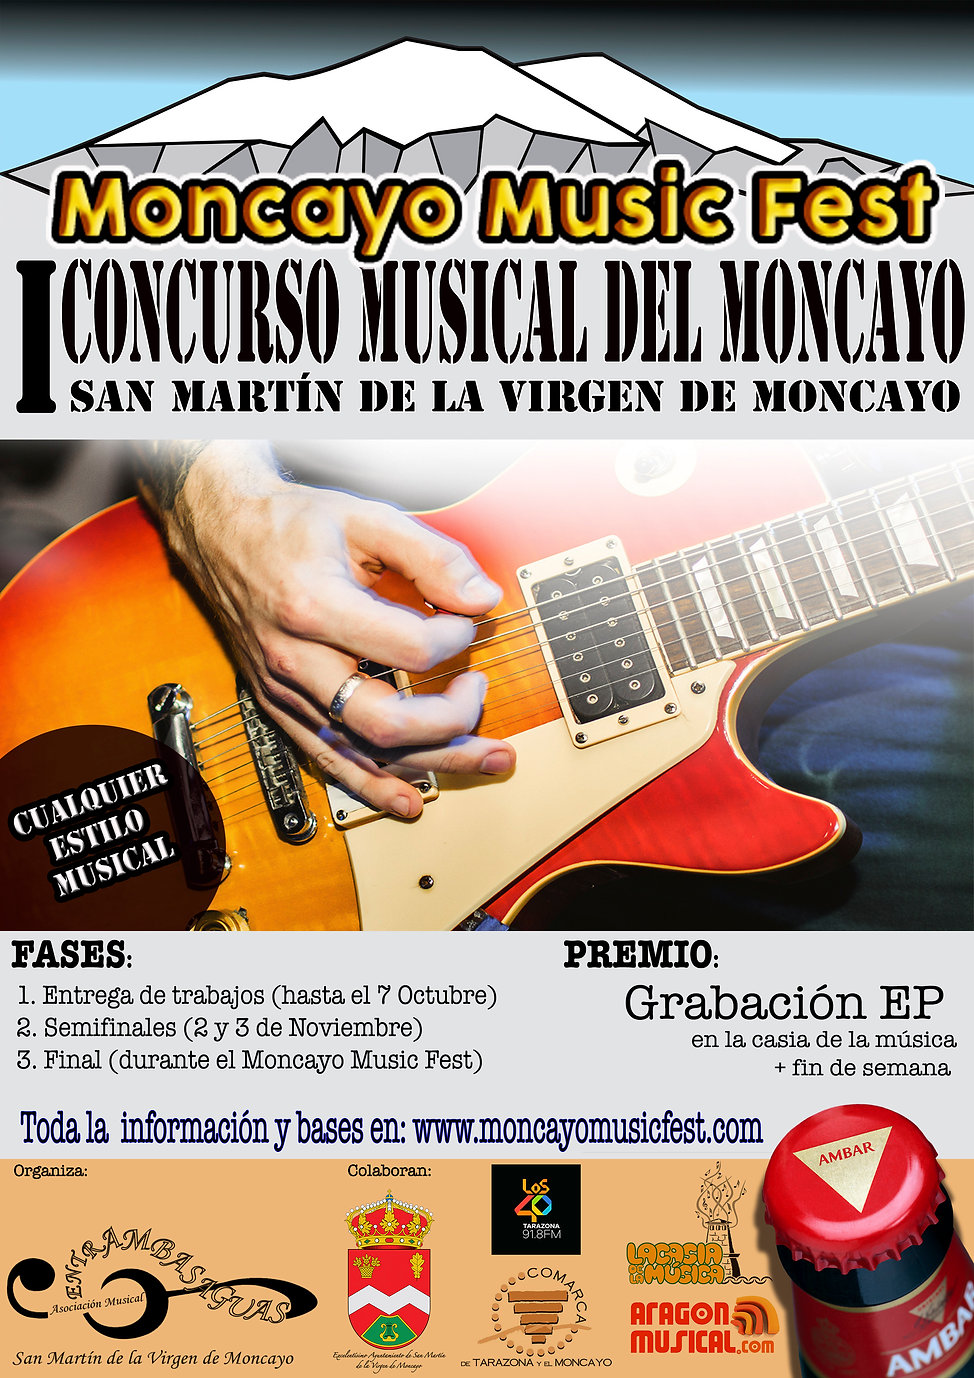 moncayo music fest san martin de moncayo